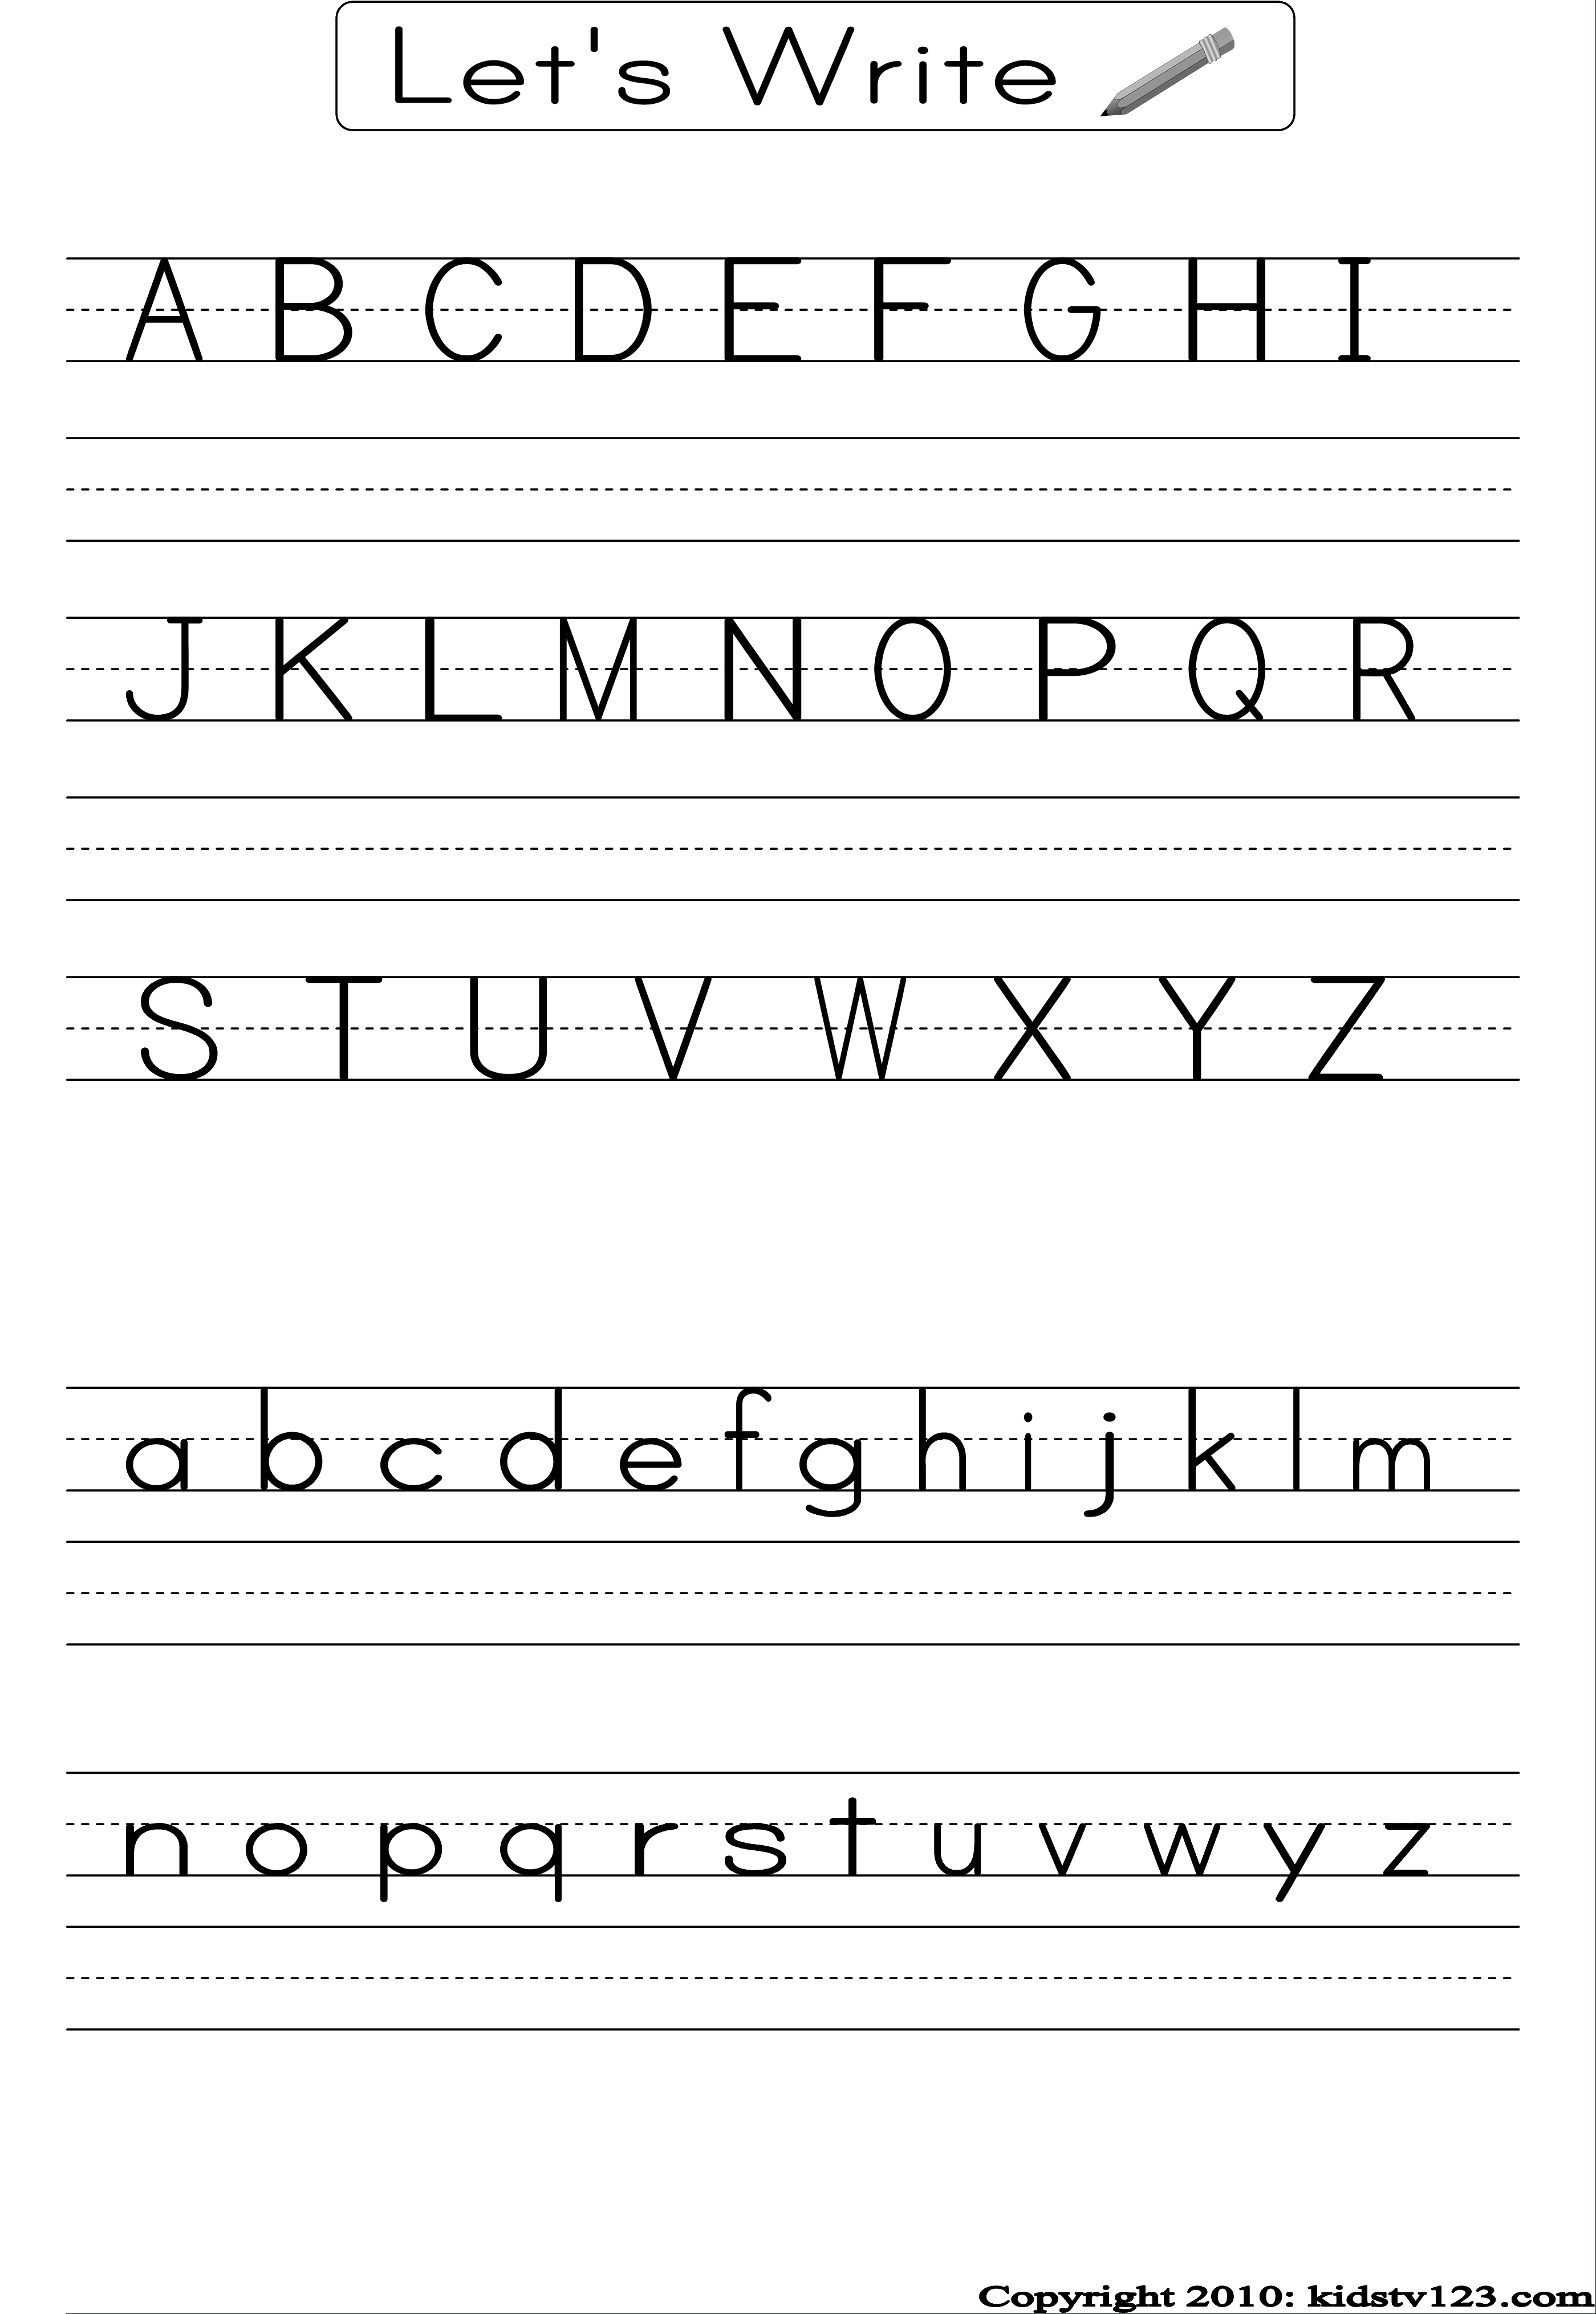 Alphabet Writing Practice Sheet | Edu-Fun | Alphabet Worksheets | Printable Alphabet Handwriting Worksheets